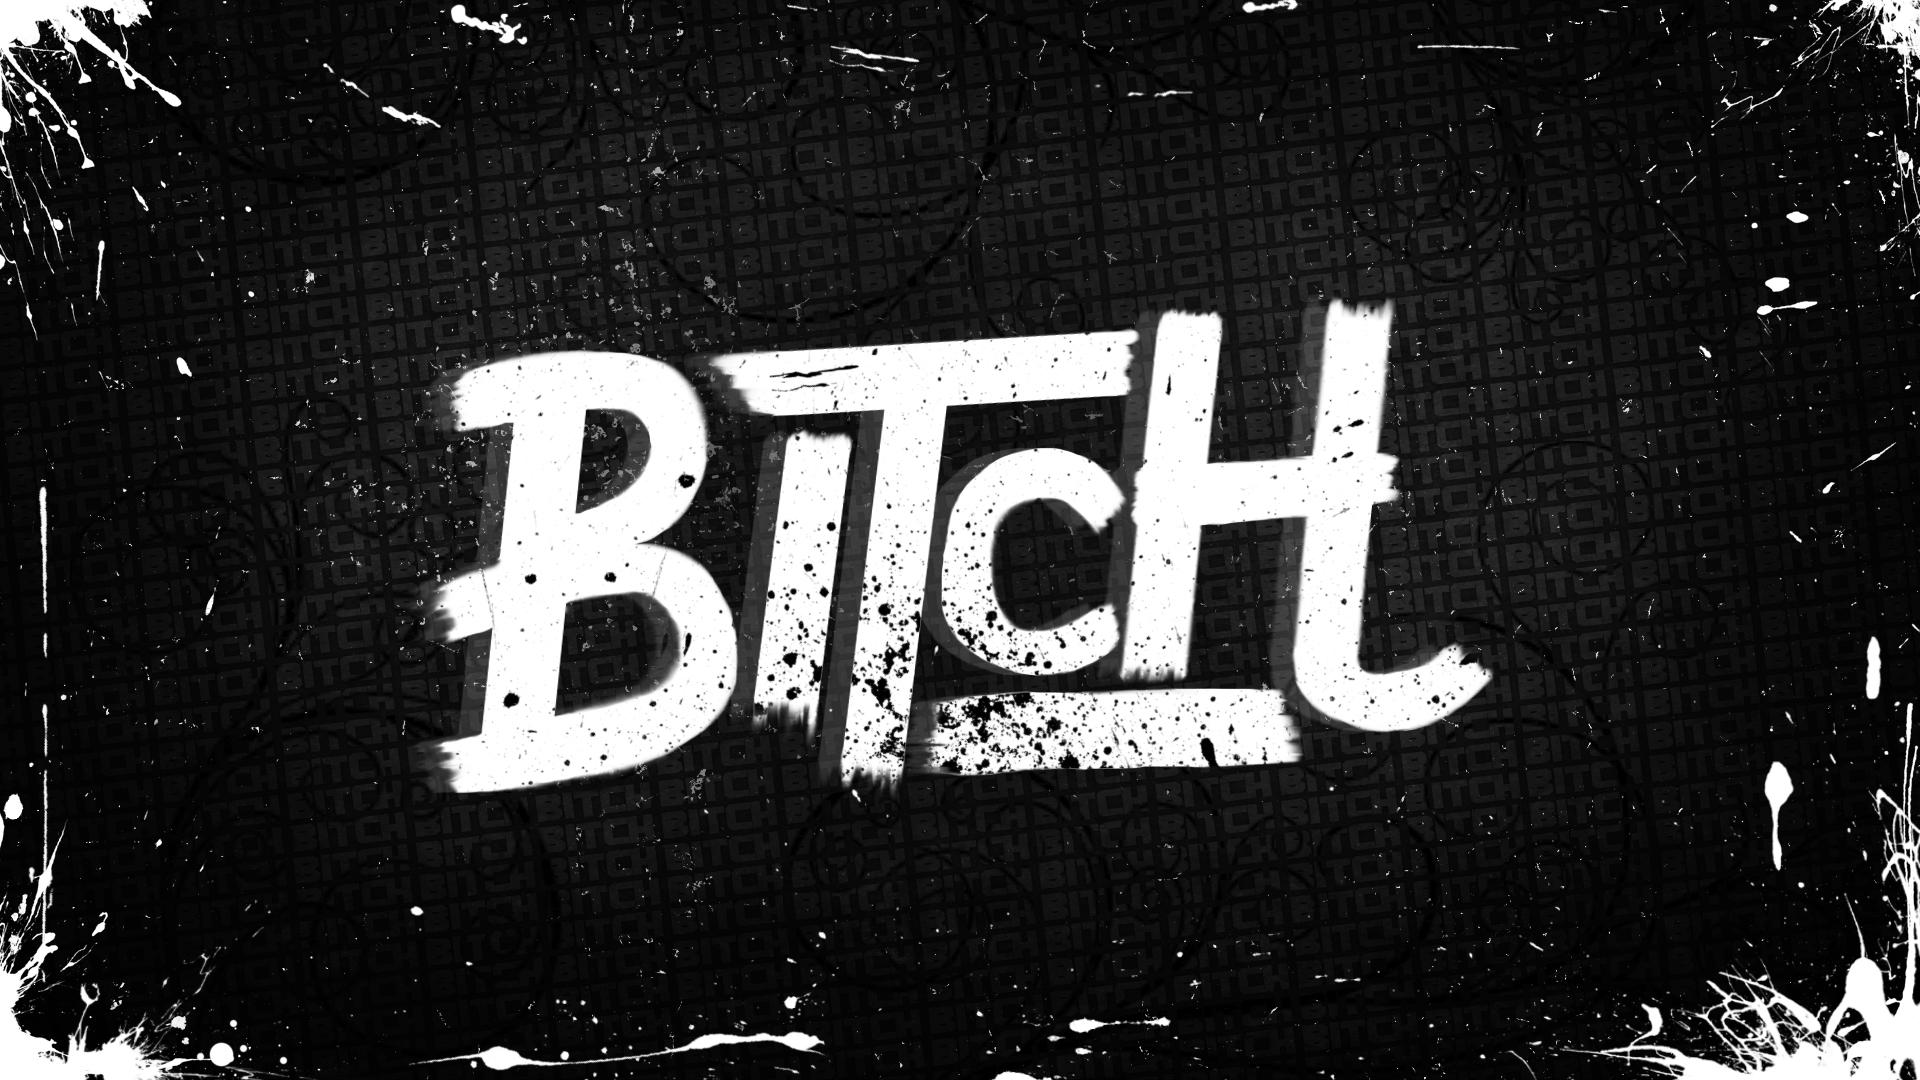 bitch-wallpapers-HD6.jpg